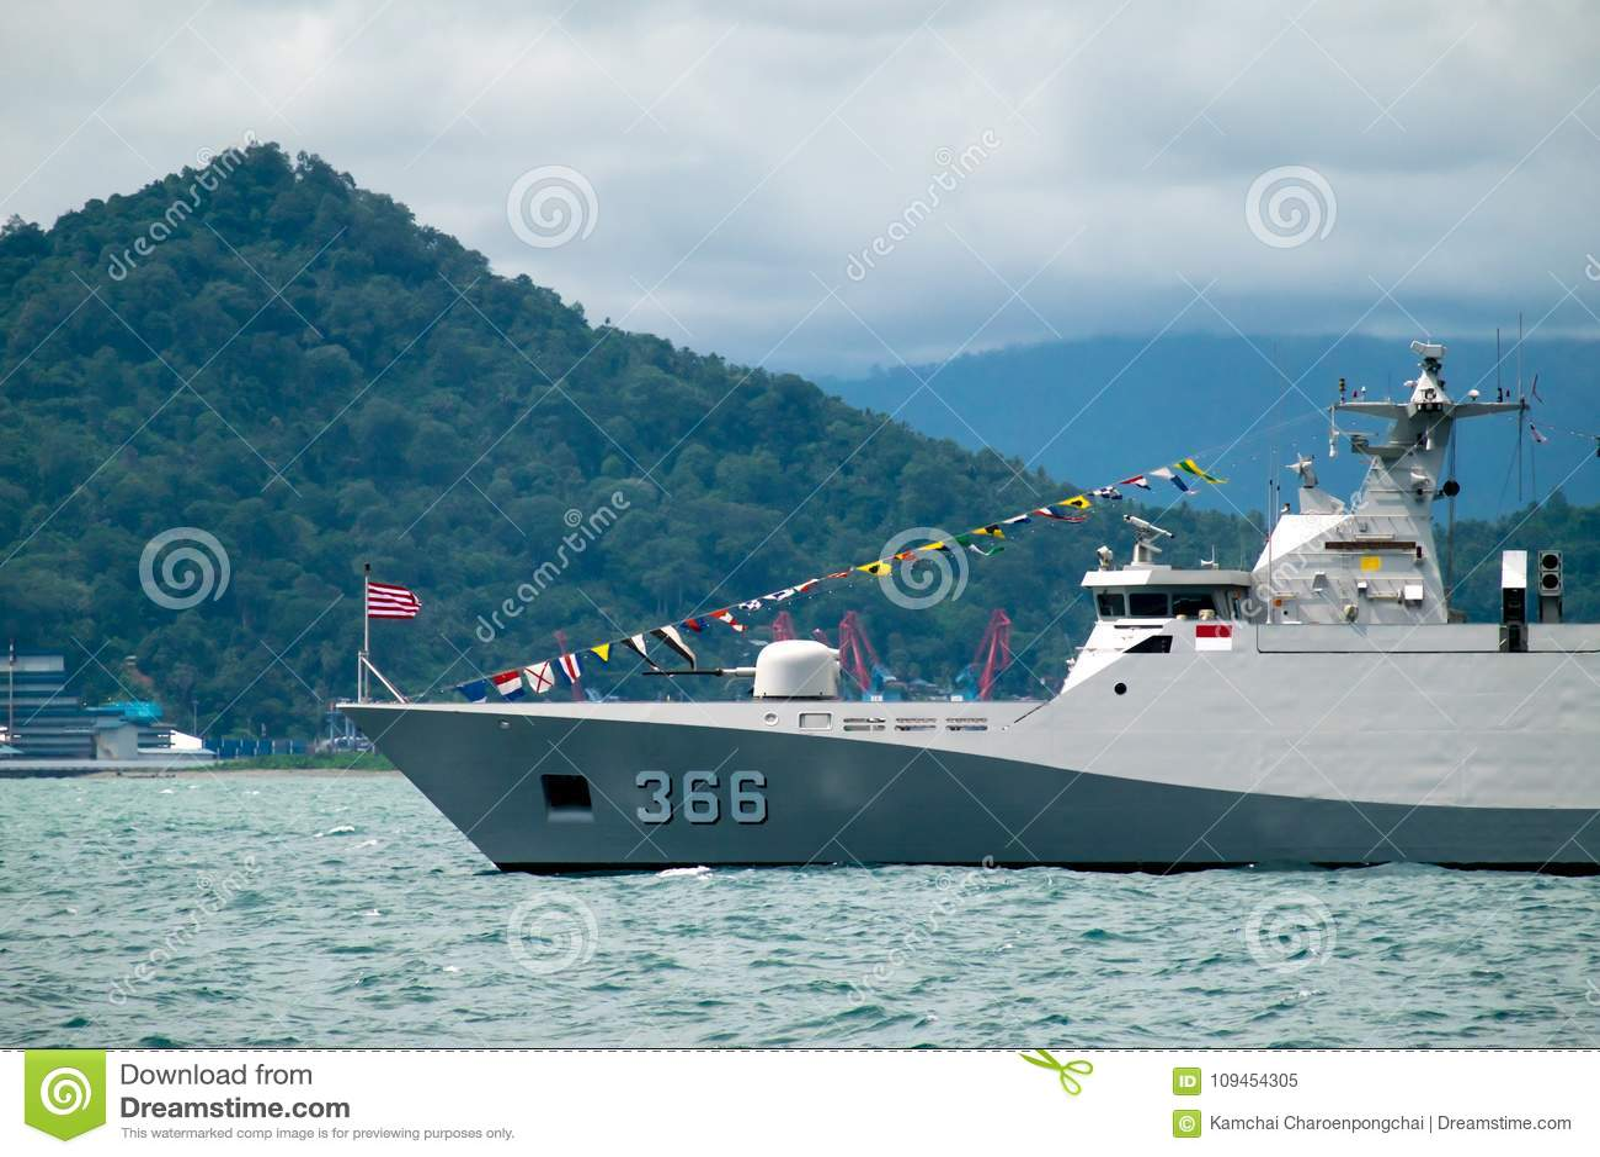 Padang海湾,印度尼西亚, 2016年4月13日:KRI苏丹Hasanuddin斯格码印度尼西亚` s海军类大型驱逐舰是在Padang海湾的定住